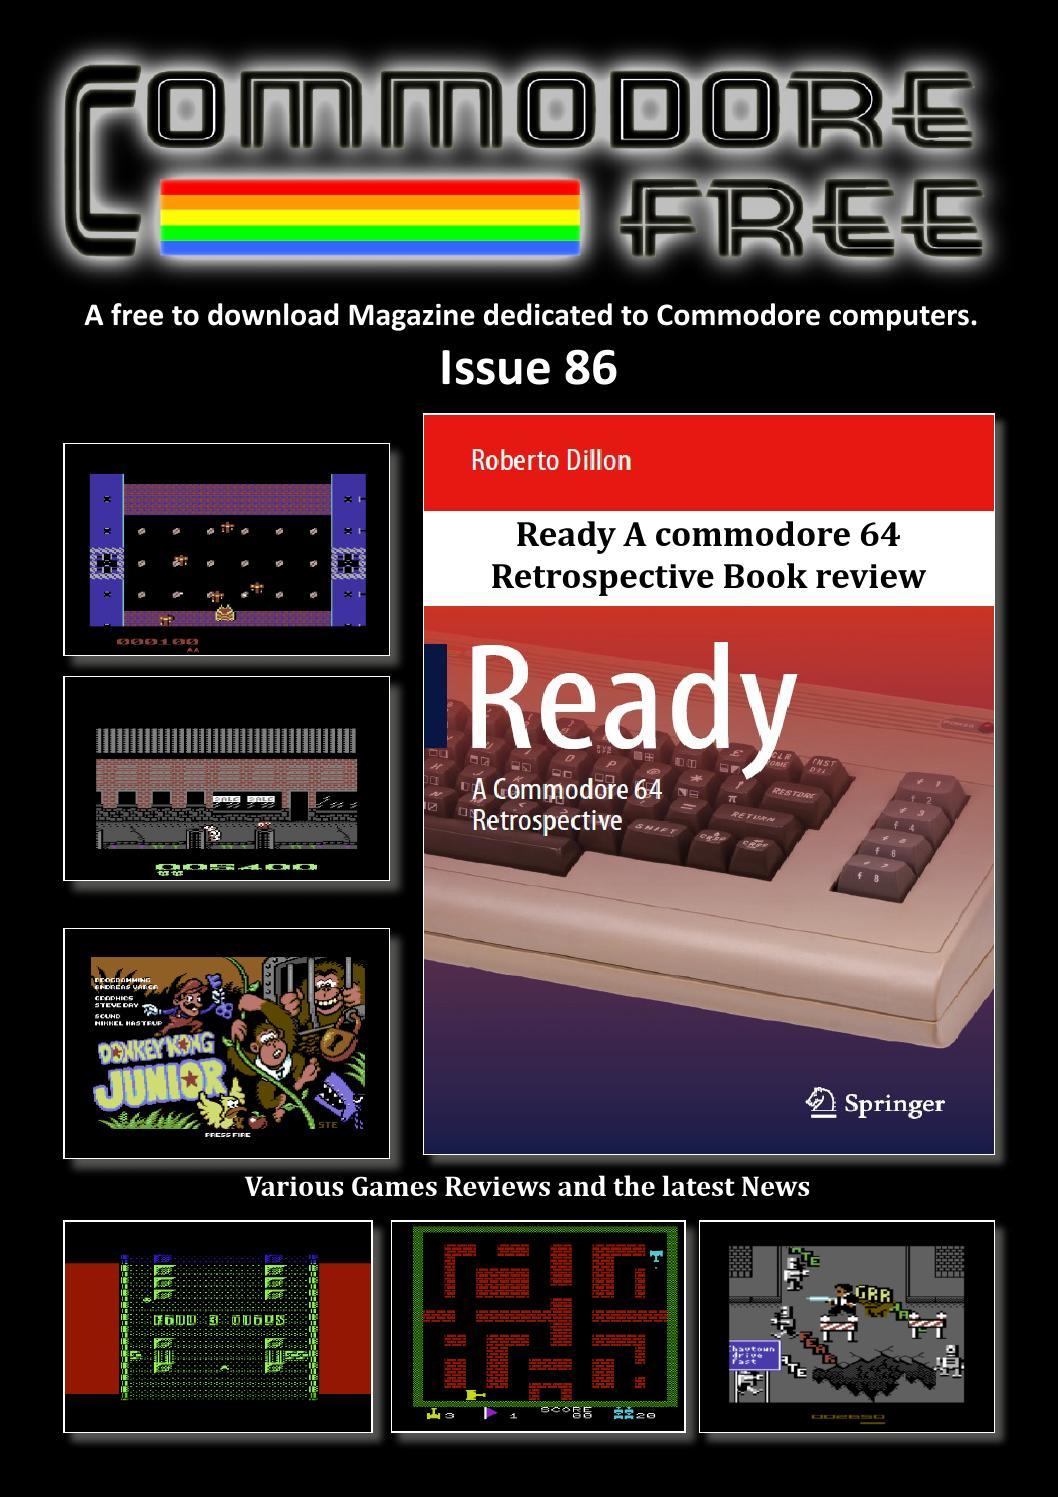 Commodore Free Issue 86 by Commodore Free Magazine - issuu